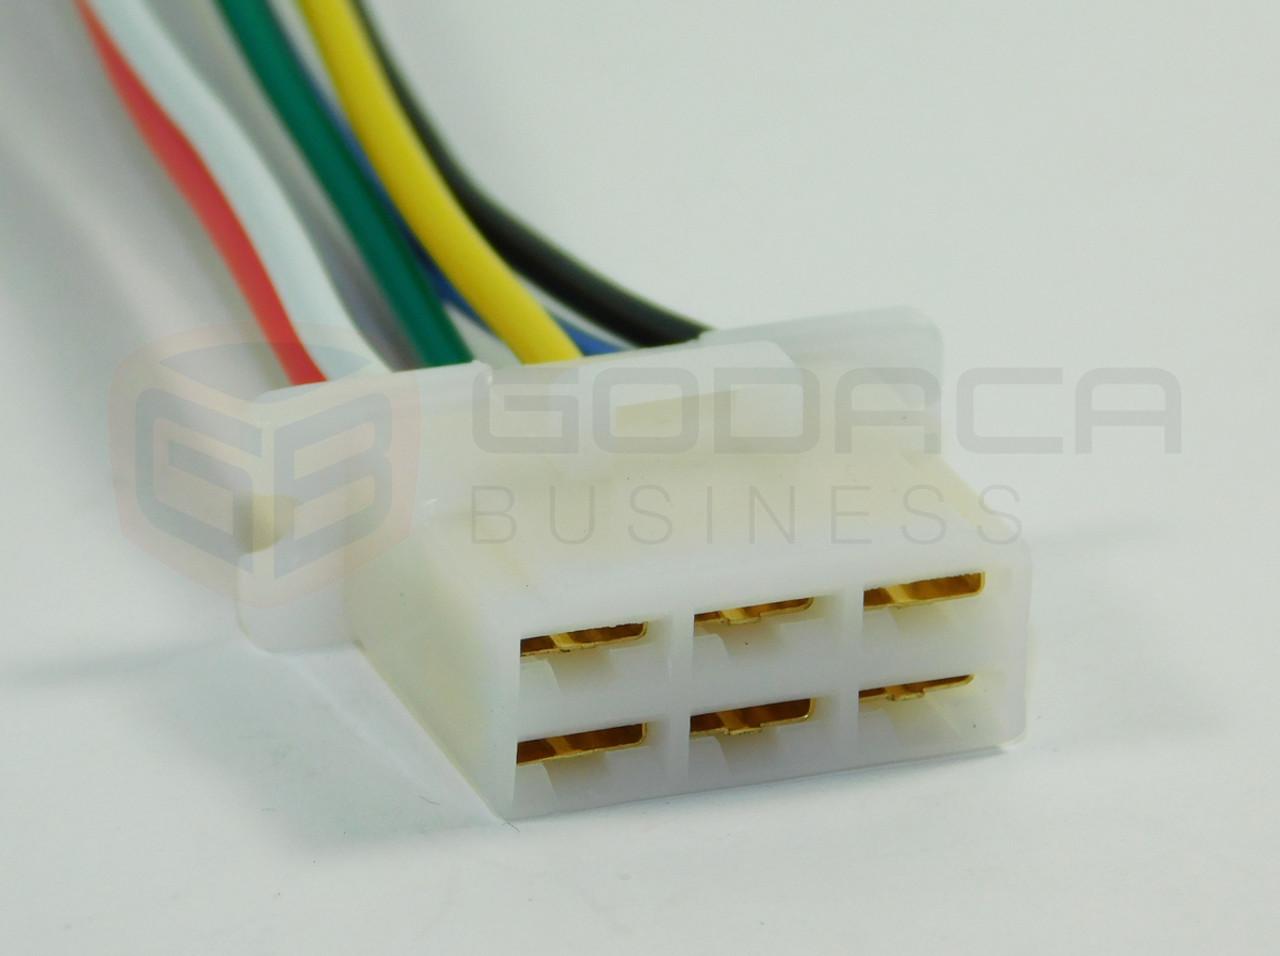 1x Connector Alternator Plug Repair Harness 6-way 6pin socket Female ...